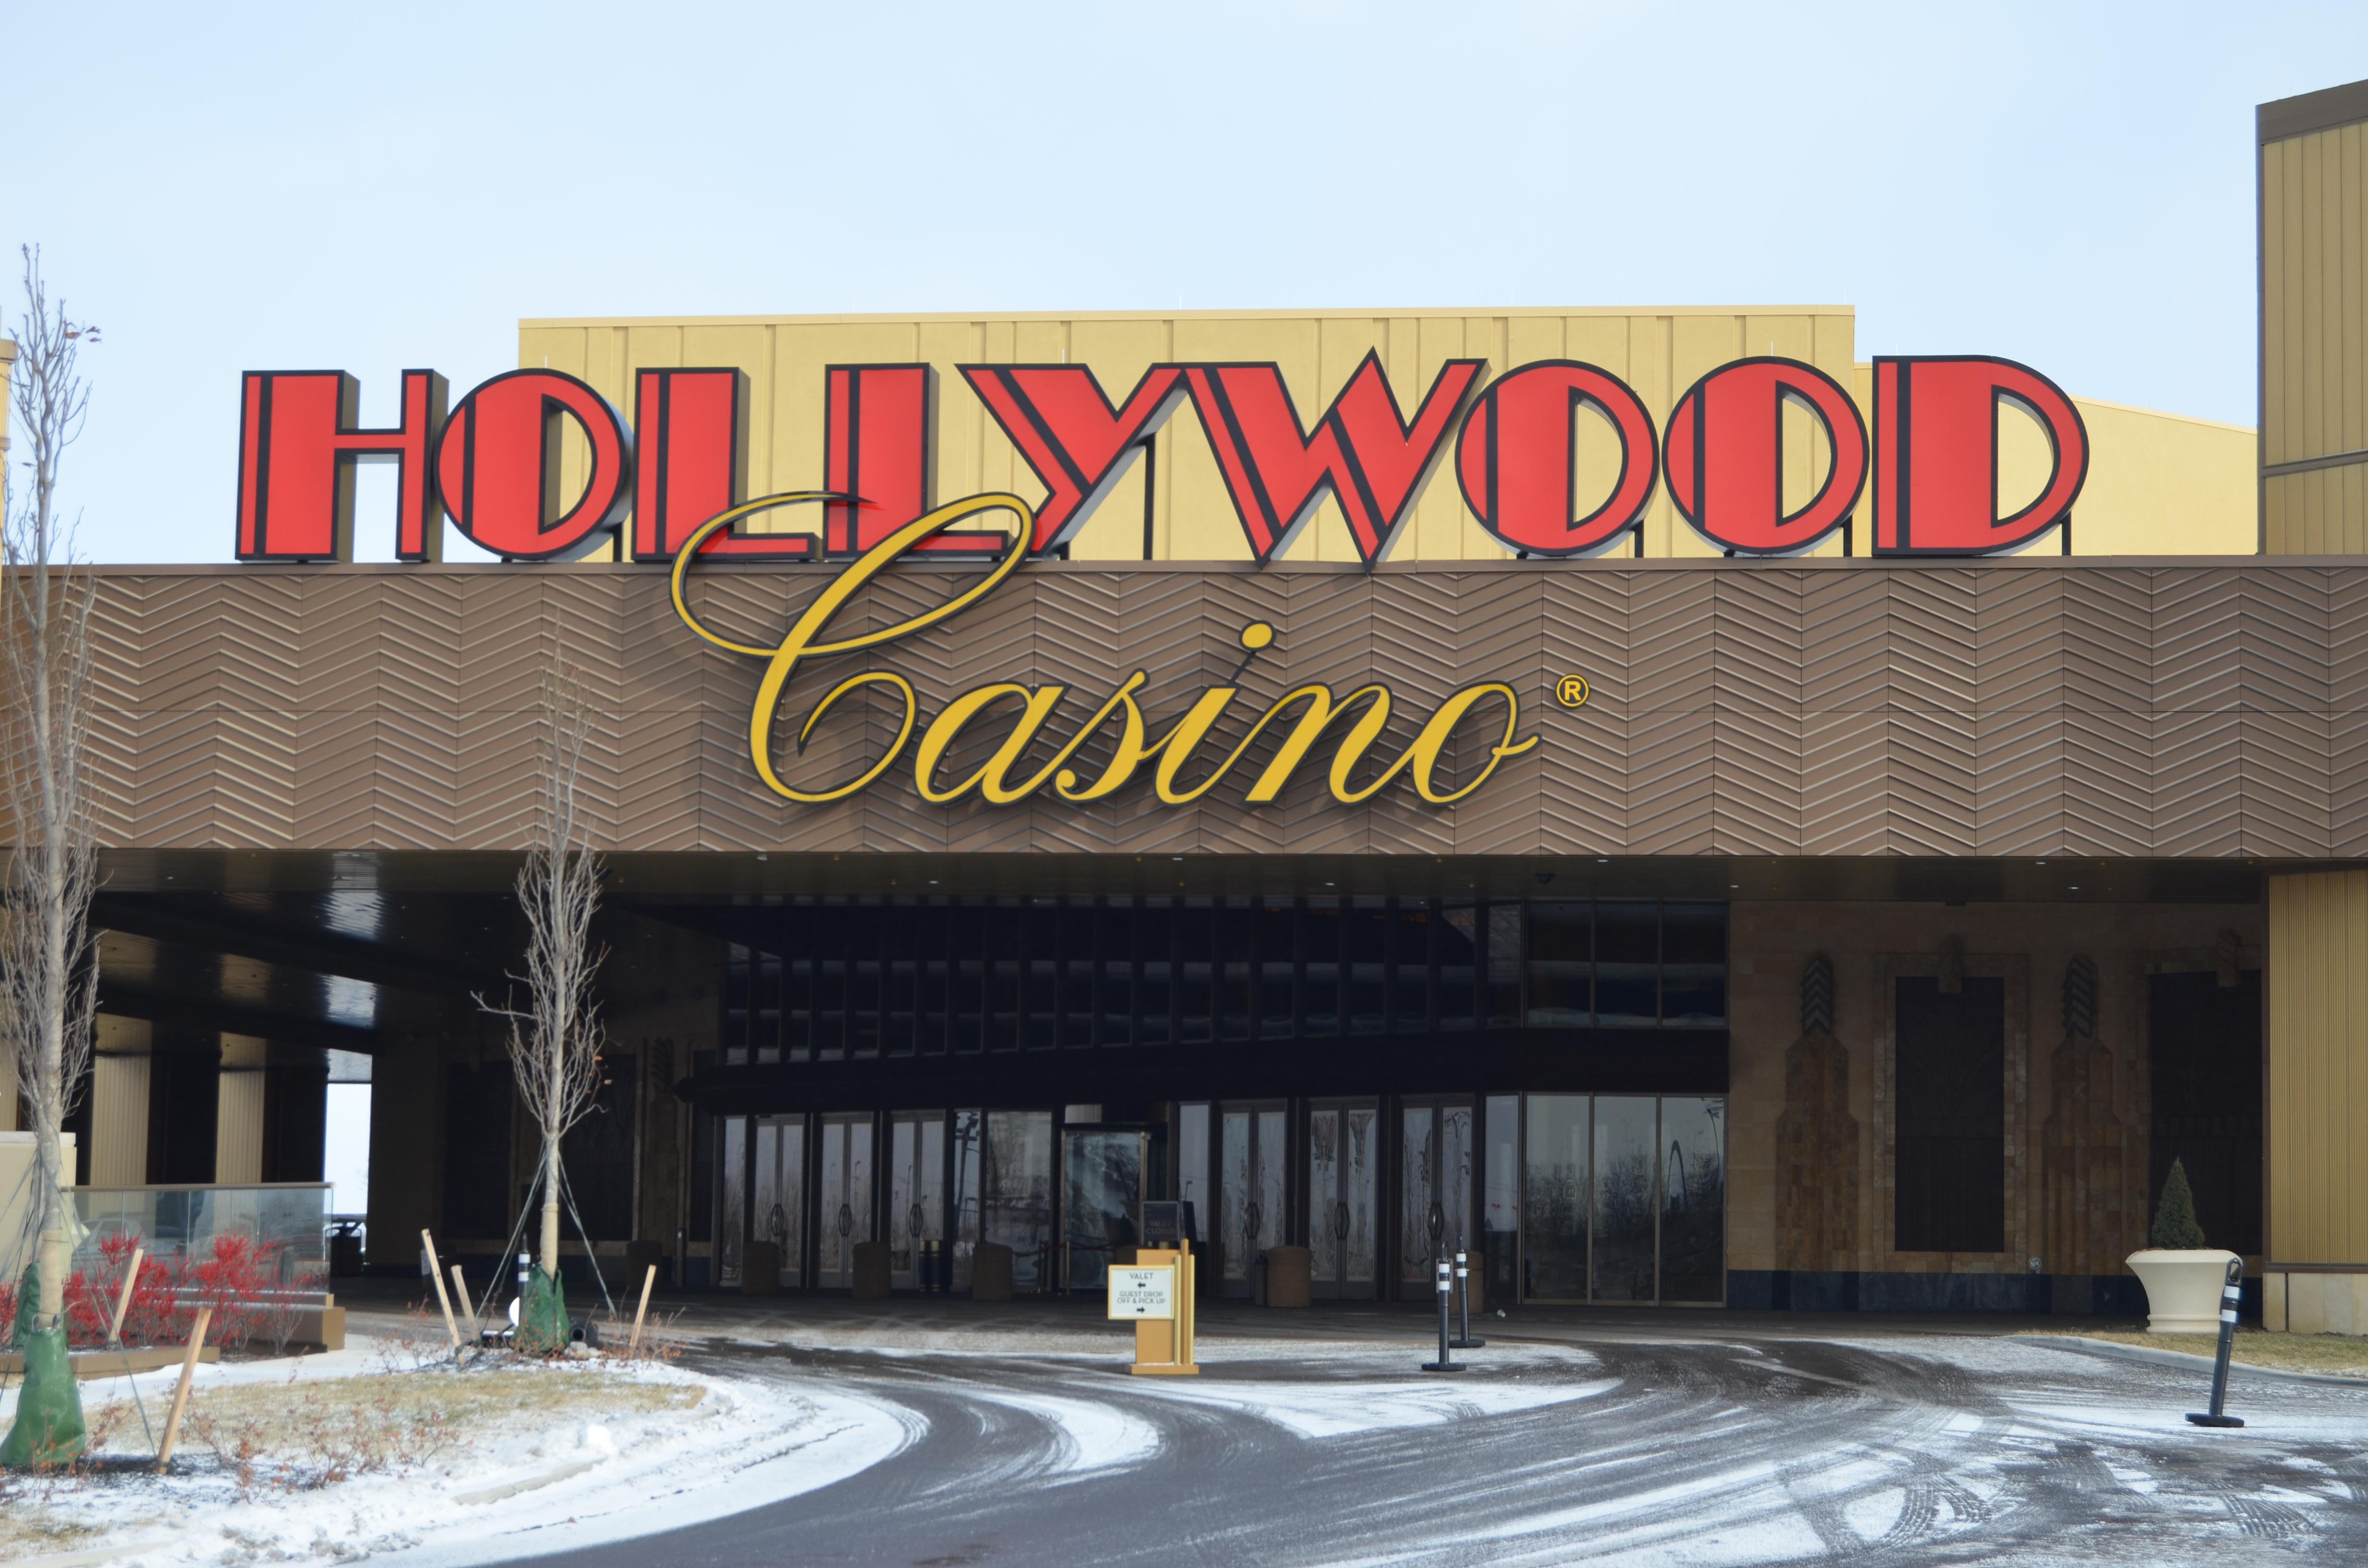 Casino columbus ohio uk complaint gambling commission